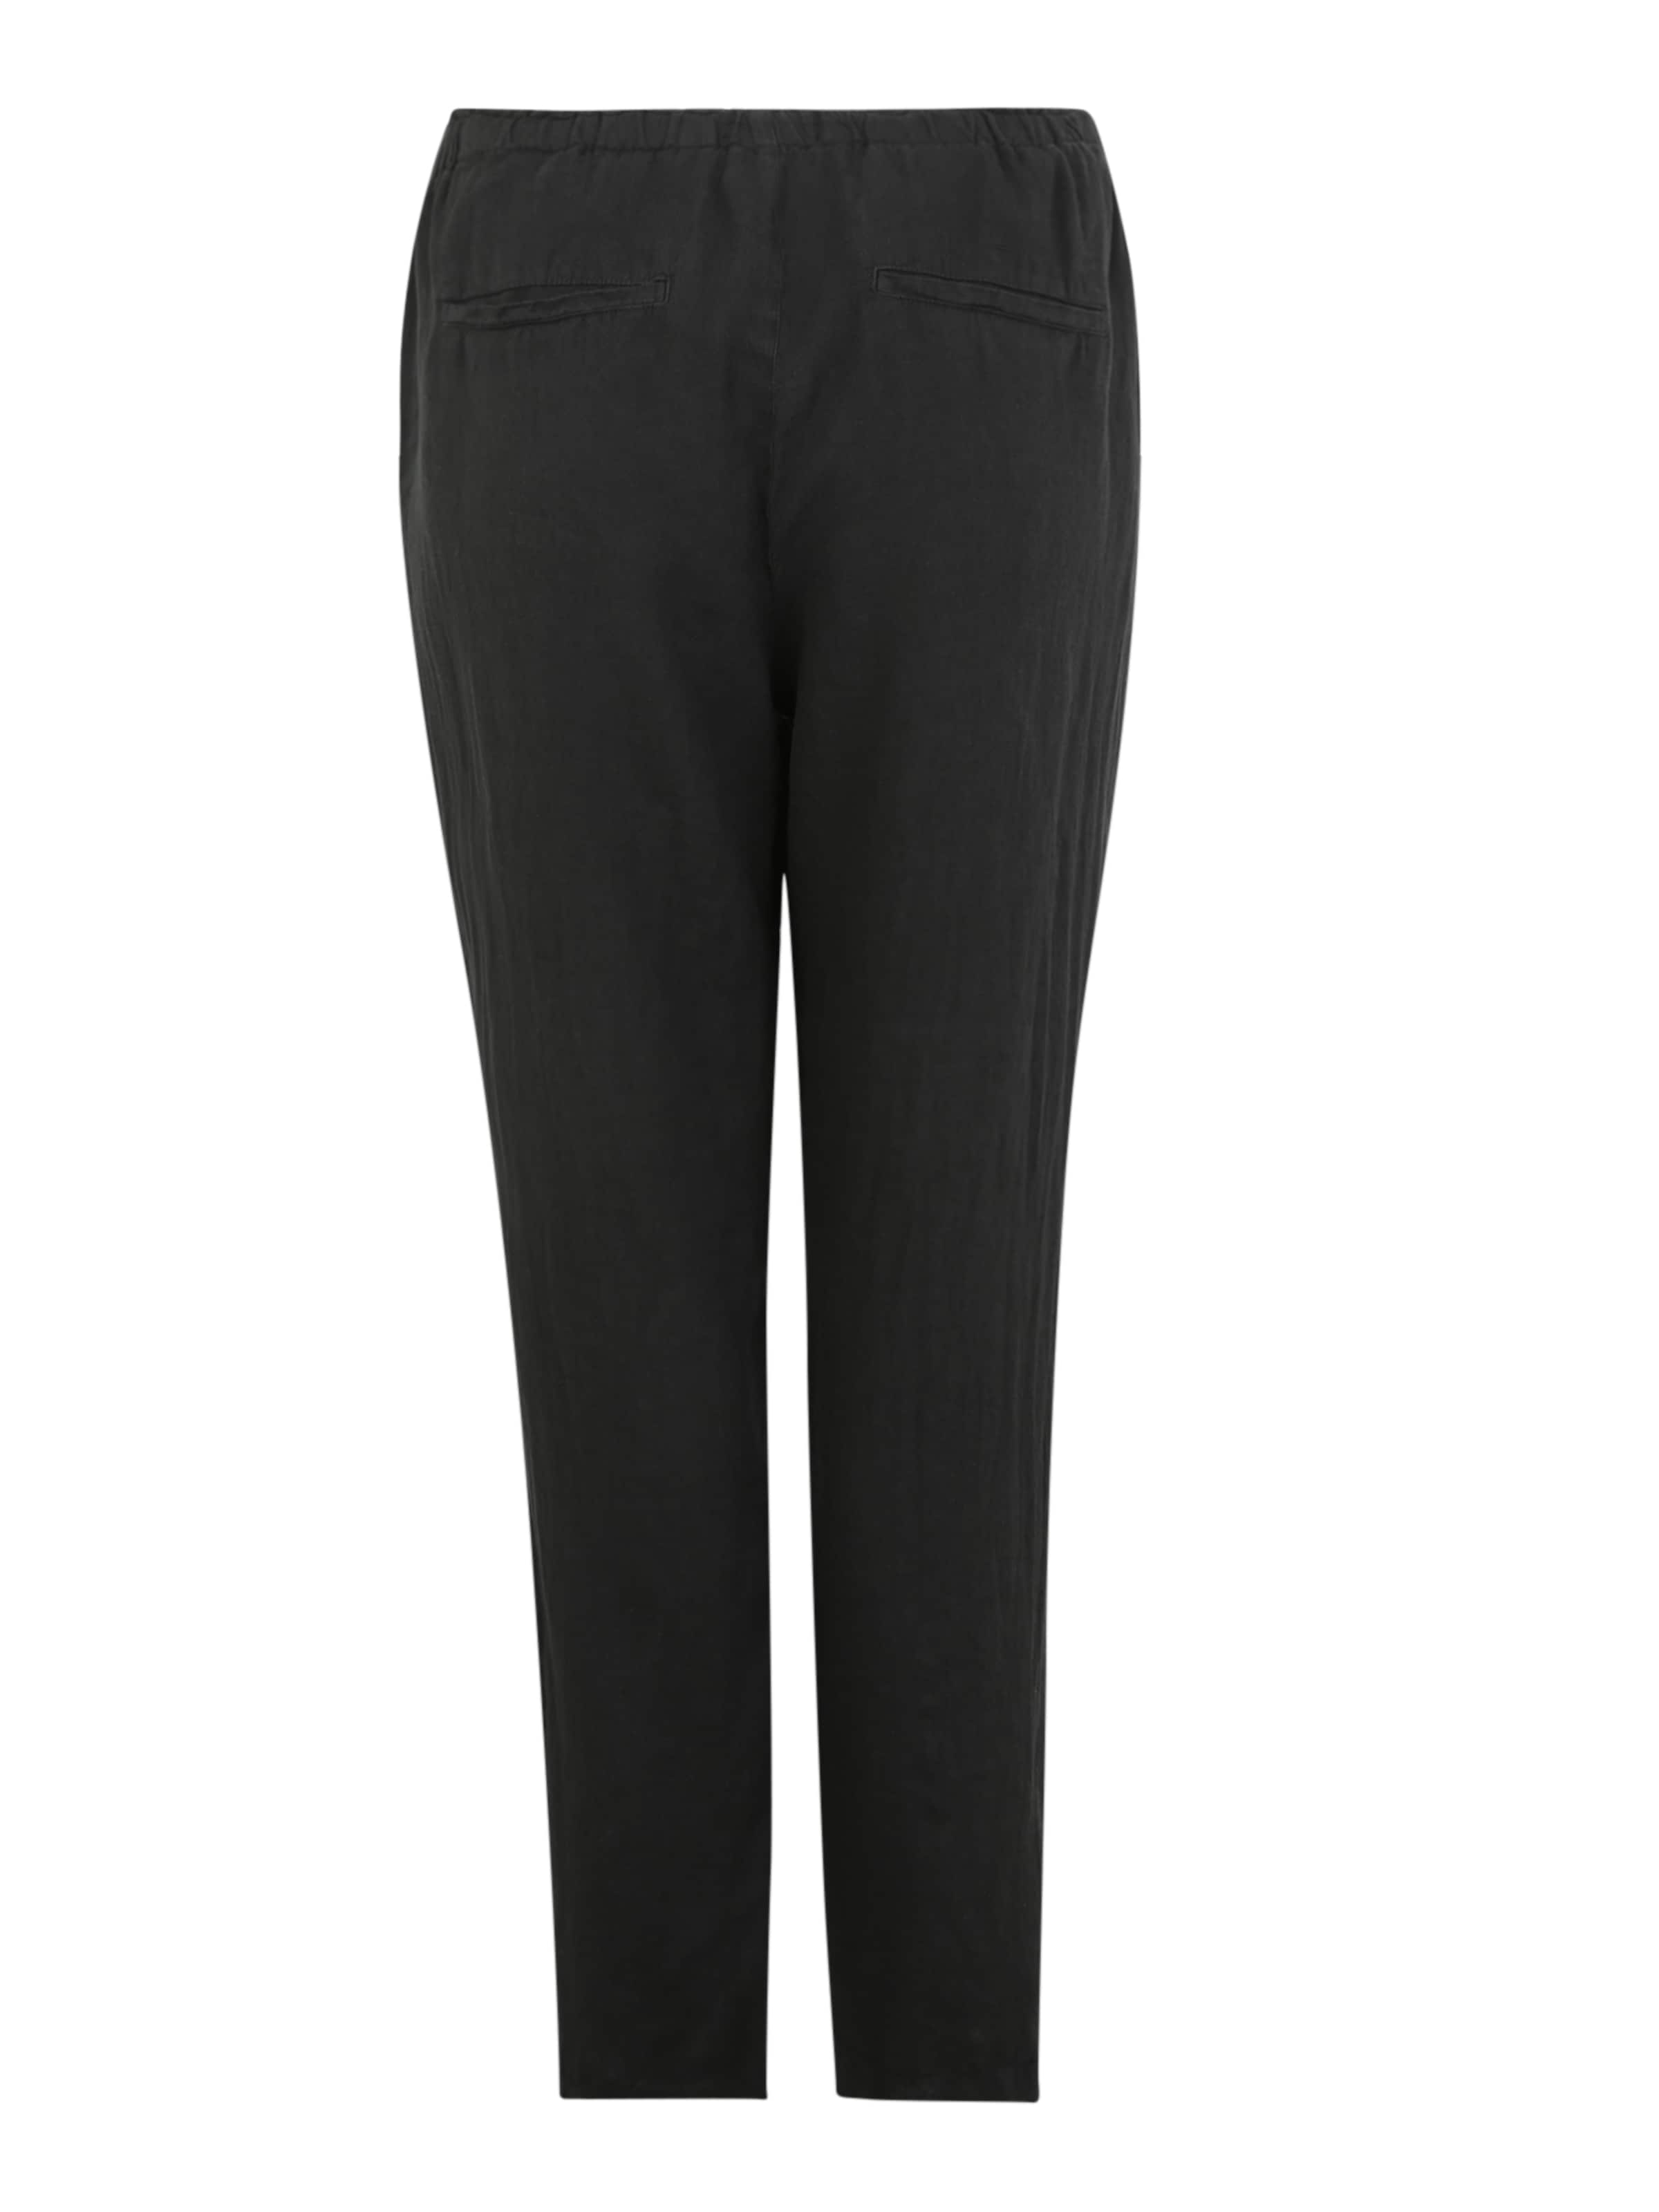 Black In Triangle Denim Jeans Jeans Black Triangle Denim In OPiukXZT